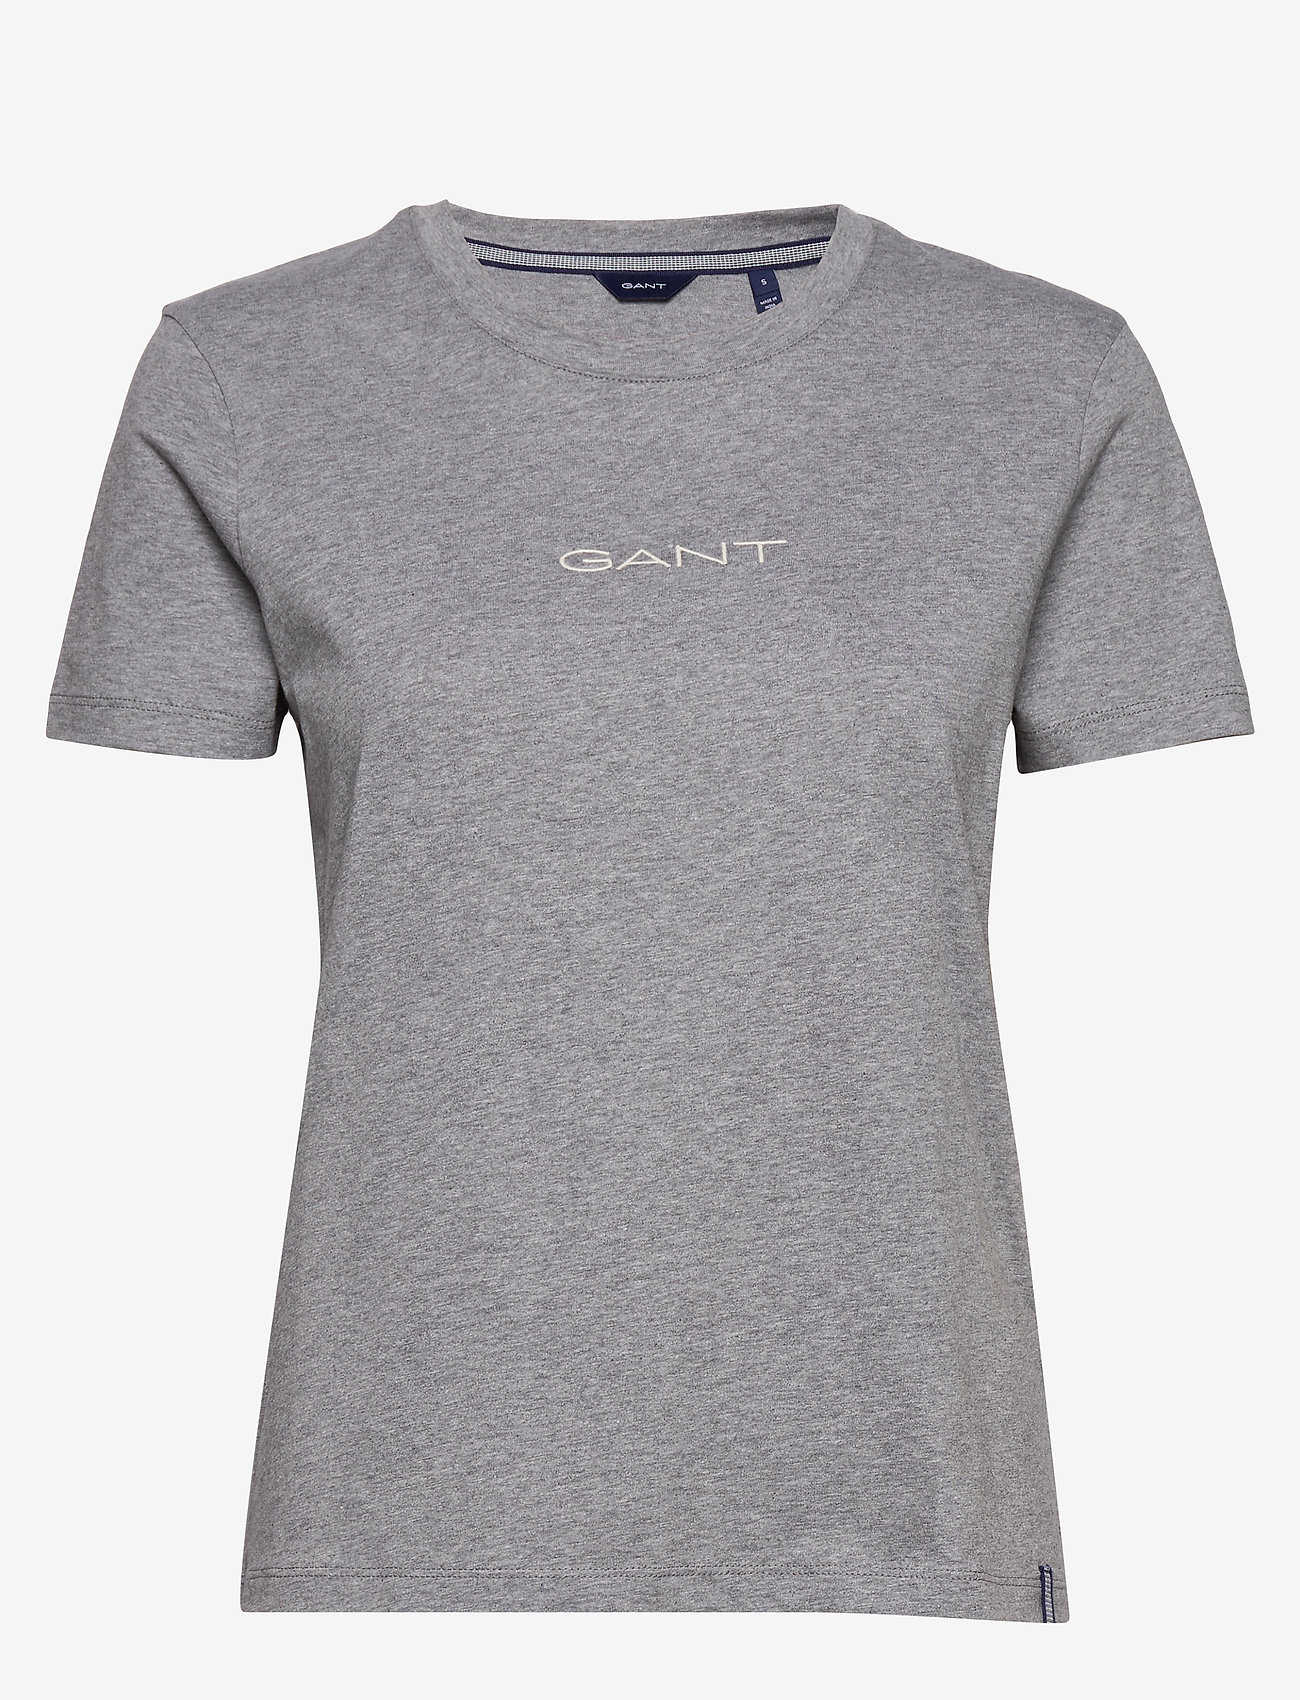 GANT - D1. 13 STRIPES SS T-SHIRT - t-shirts - grey melange - 0